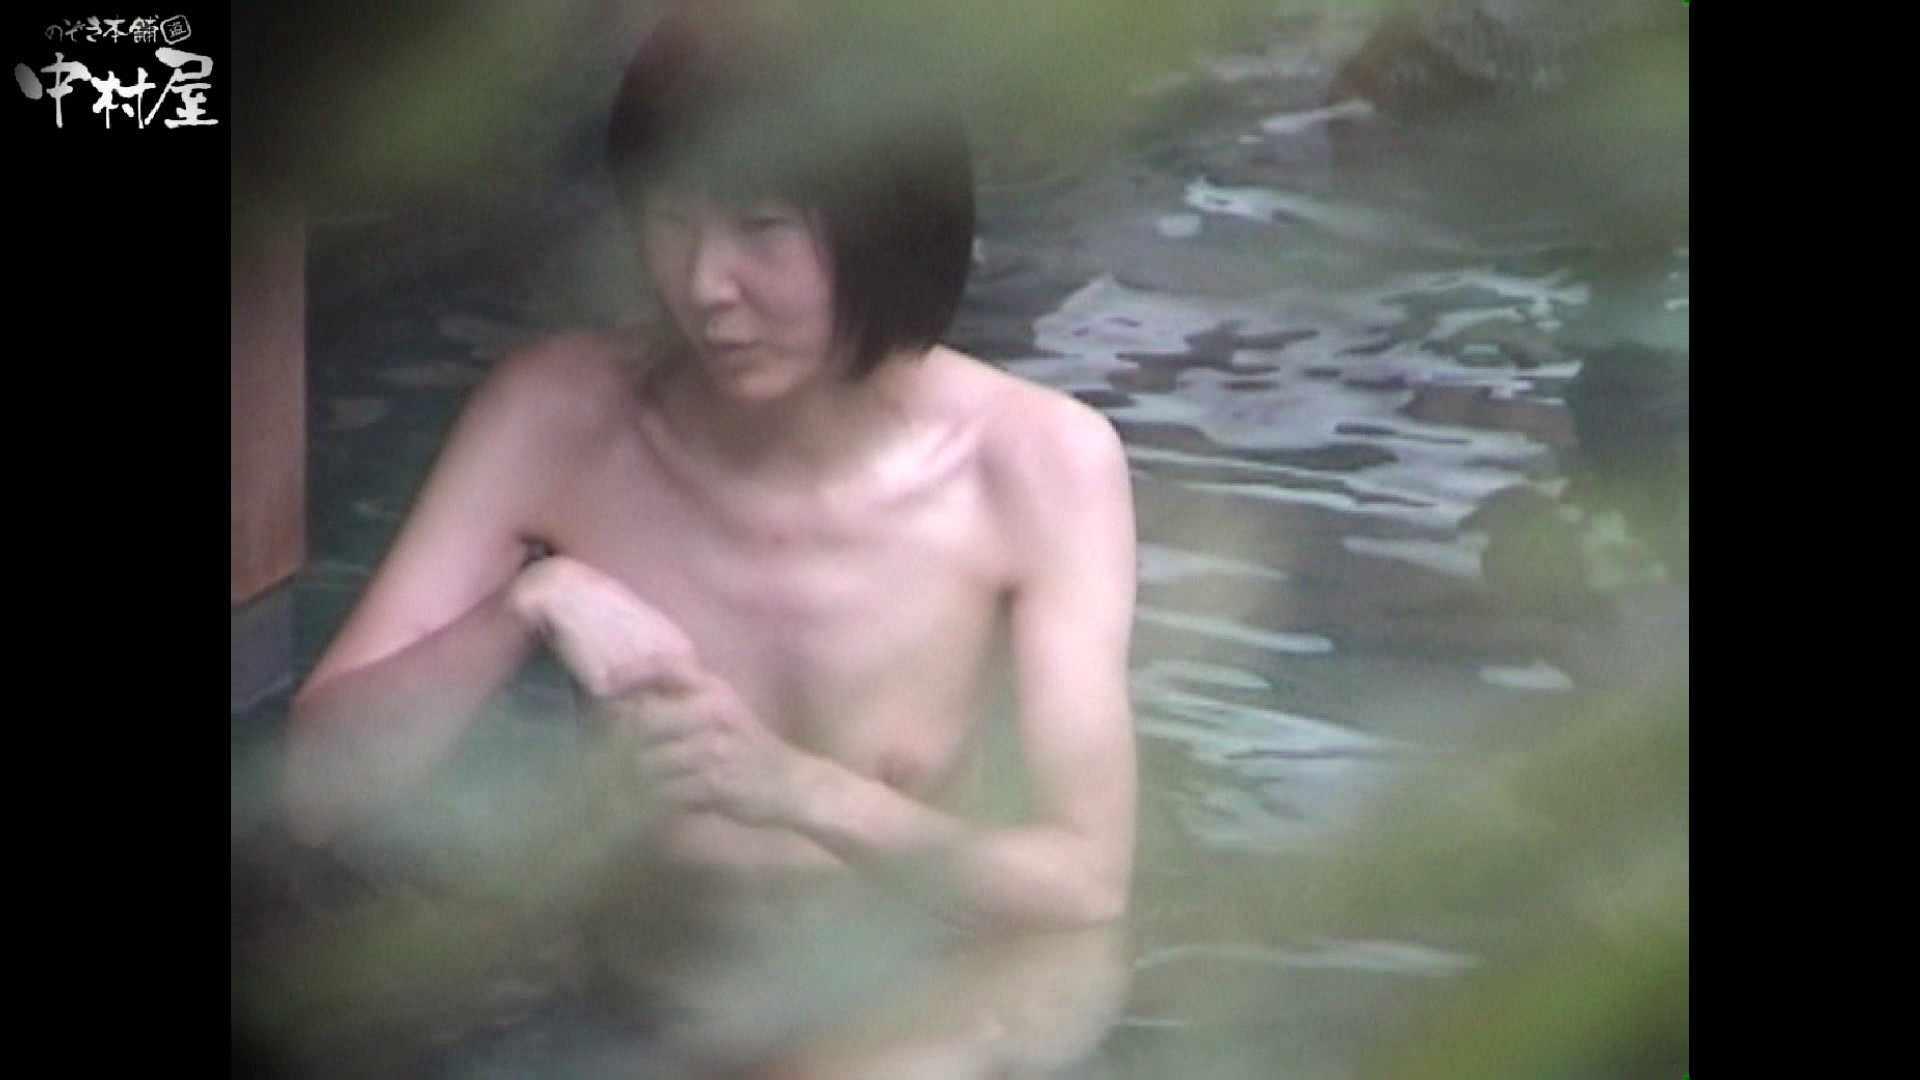 Aquaな露天風呂Vol.953 OLのエロ生活   露天風呂  107連発 103